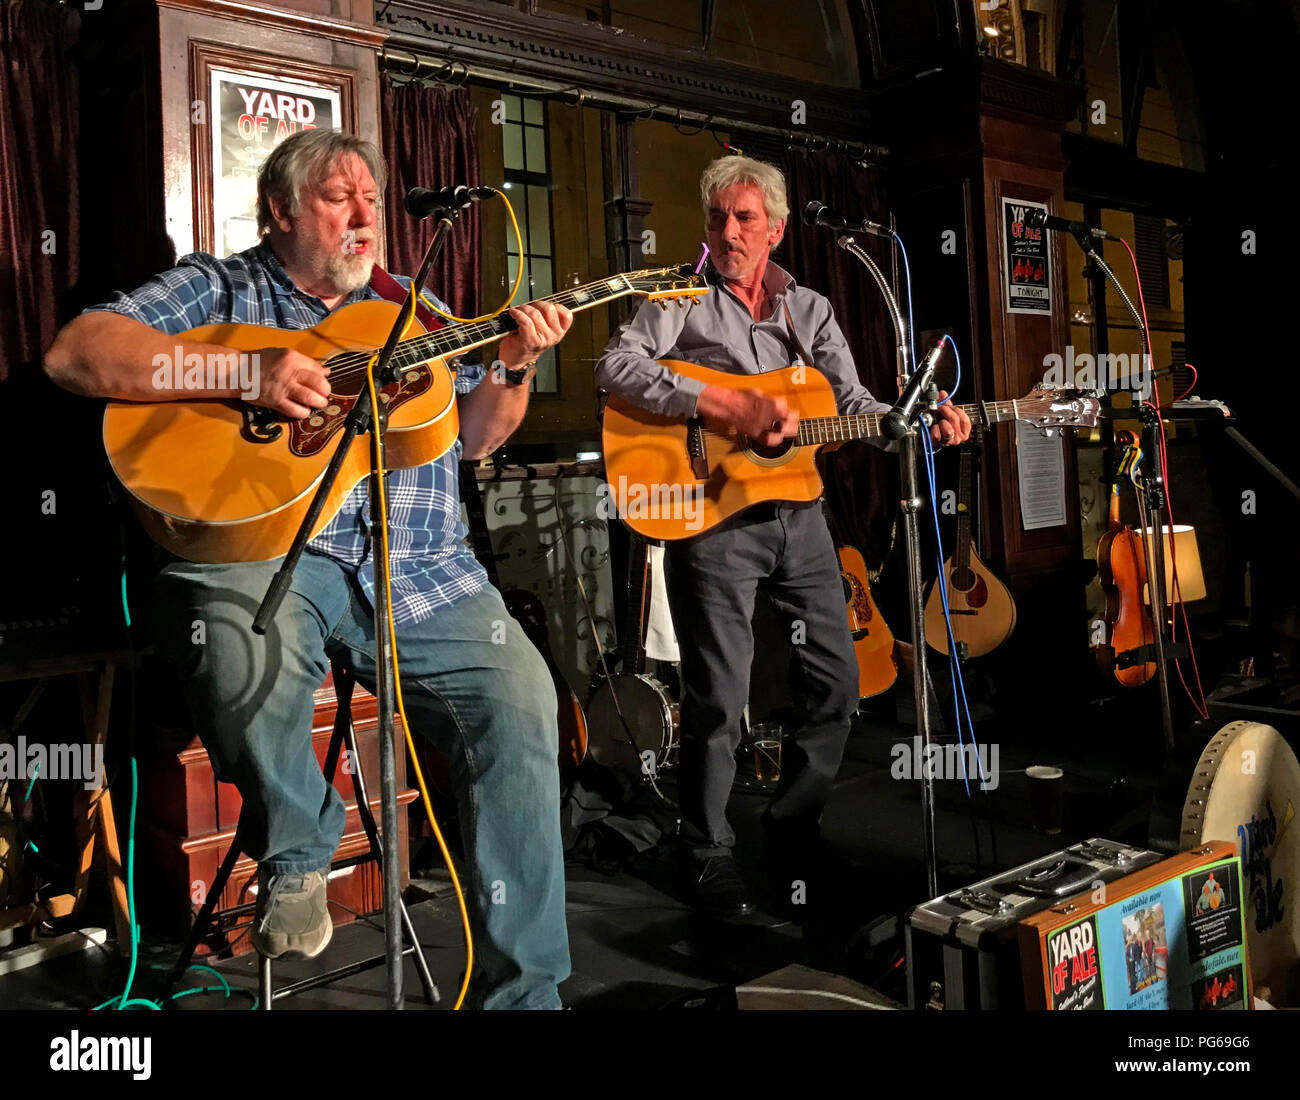 Go Tony smith,@Hotpixuk,yardofale,live,band,live on stage,Fringe,Festival,pub,bar,CAMRA,real ale,Caledonian Folk and Blues Festival,Caledonian Folk,Blues Festival,folk,blues,live folk,live blues,on stage,city centre,Edinburgh bar,fringe festival,live music,keep music live,Folk n Fun,FolknFun,Lothians,Lothian,entertainment,bar entertainment,Caledonian Blues Festival,Caledonian Folk Festival,Peter Gillan,Alistair McDougald,Walter Mowat,Guildford Arms,Guildford Arms Edinburgh,GoTonySmith